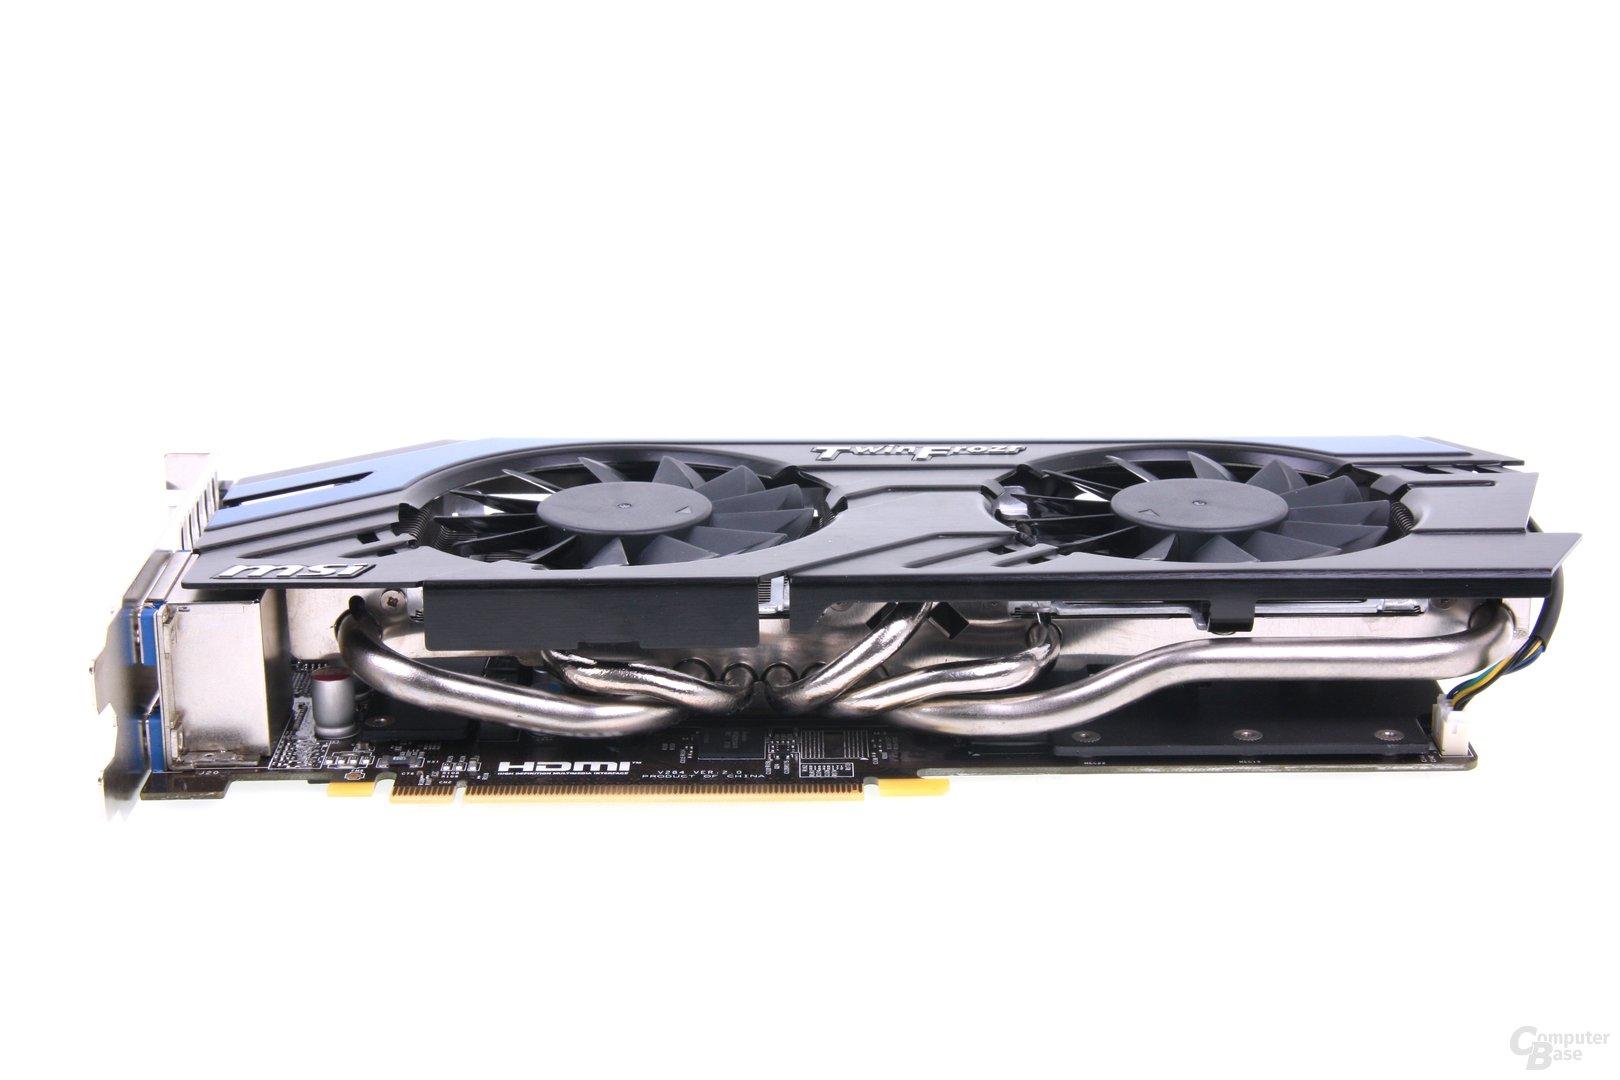 GeForce GTX 670 PE OC Heatpipes